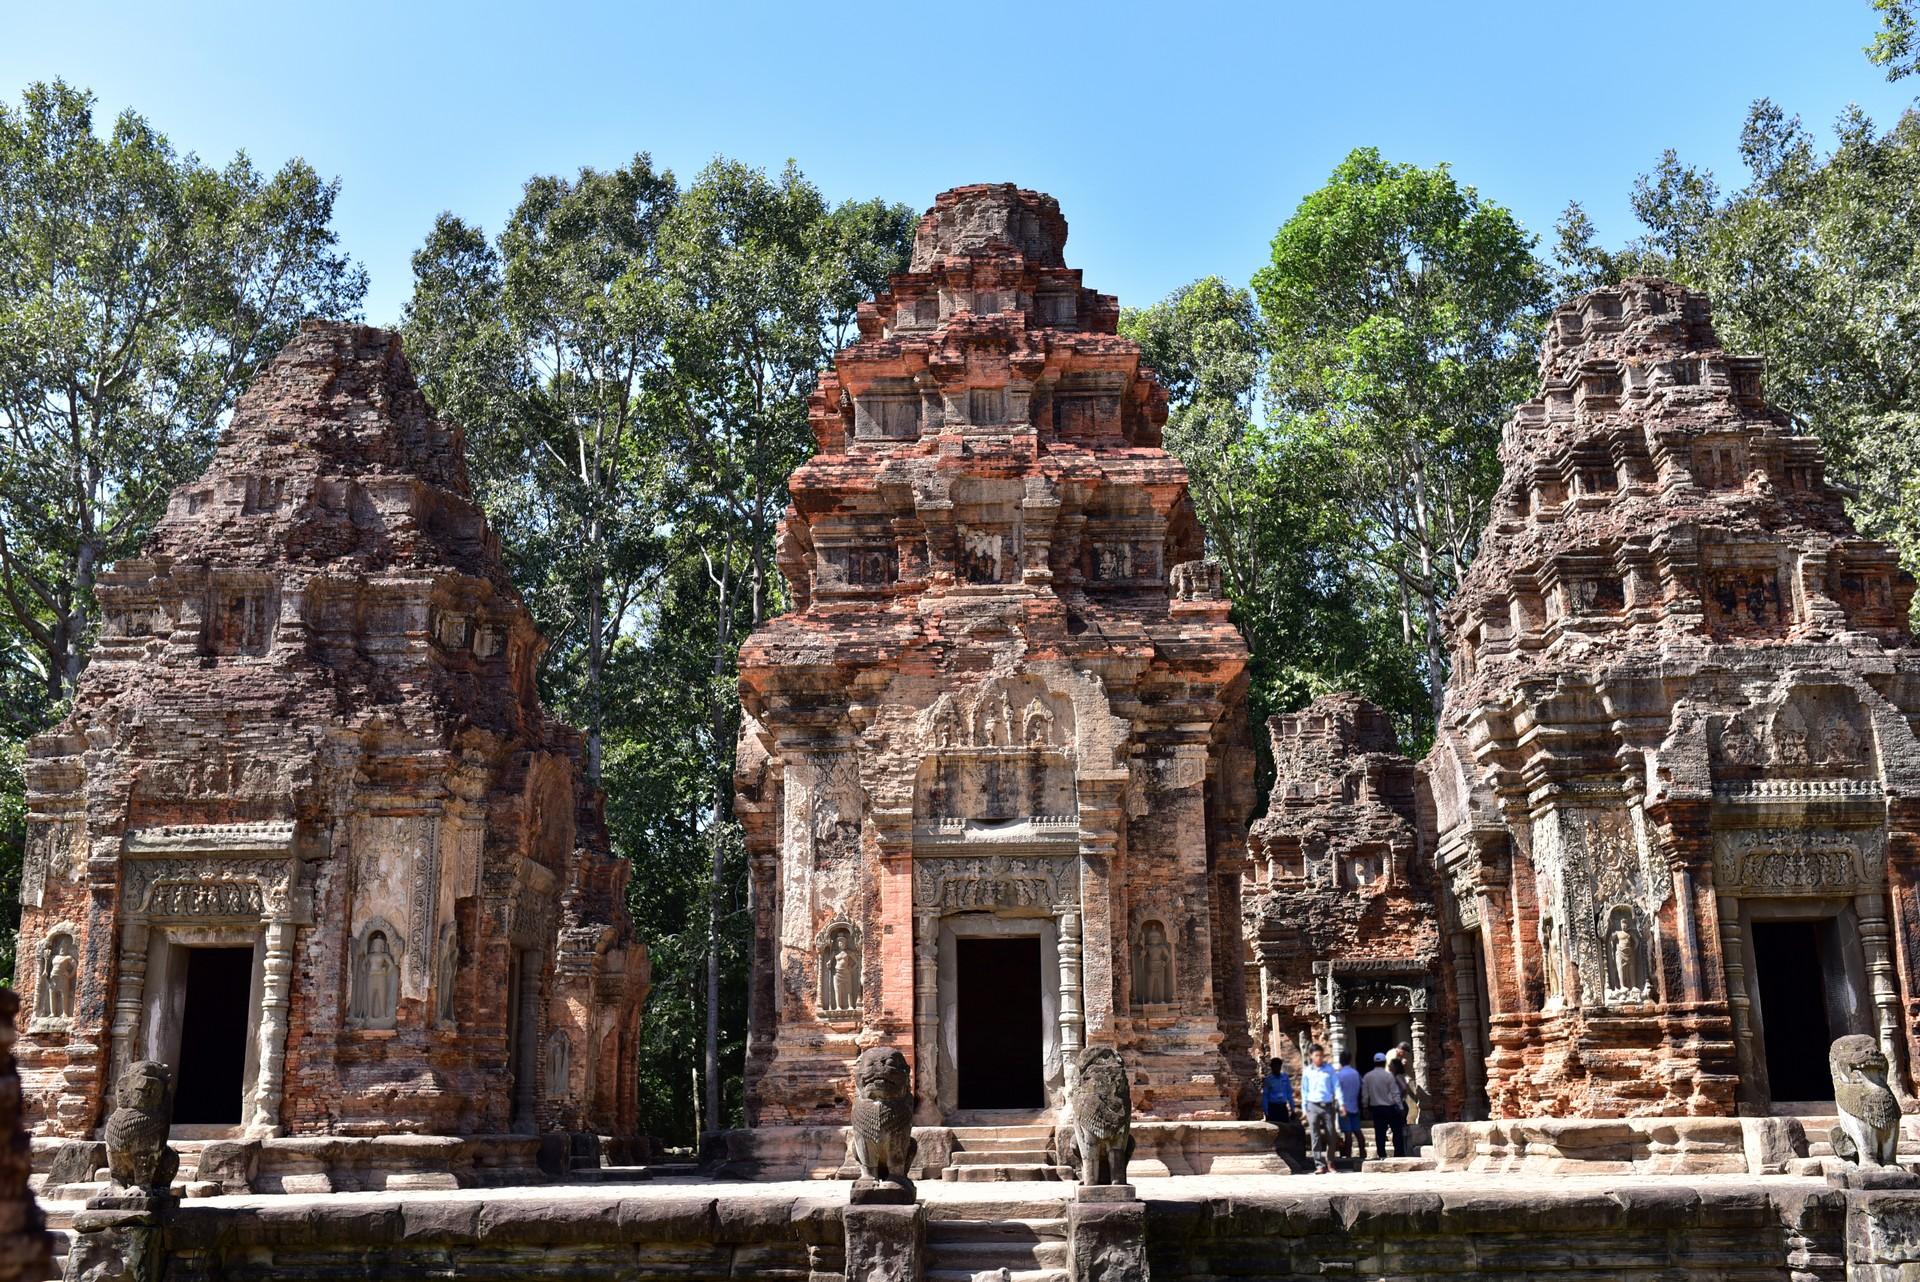 Roluos temples in cambodia